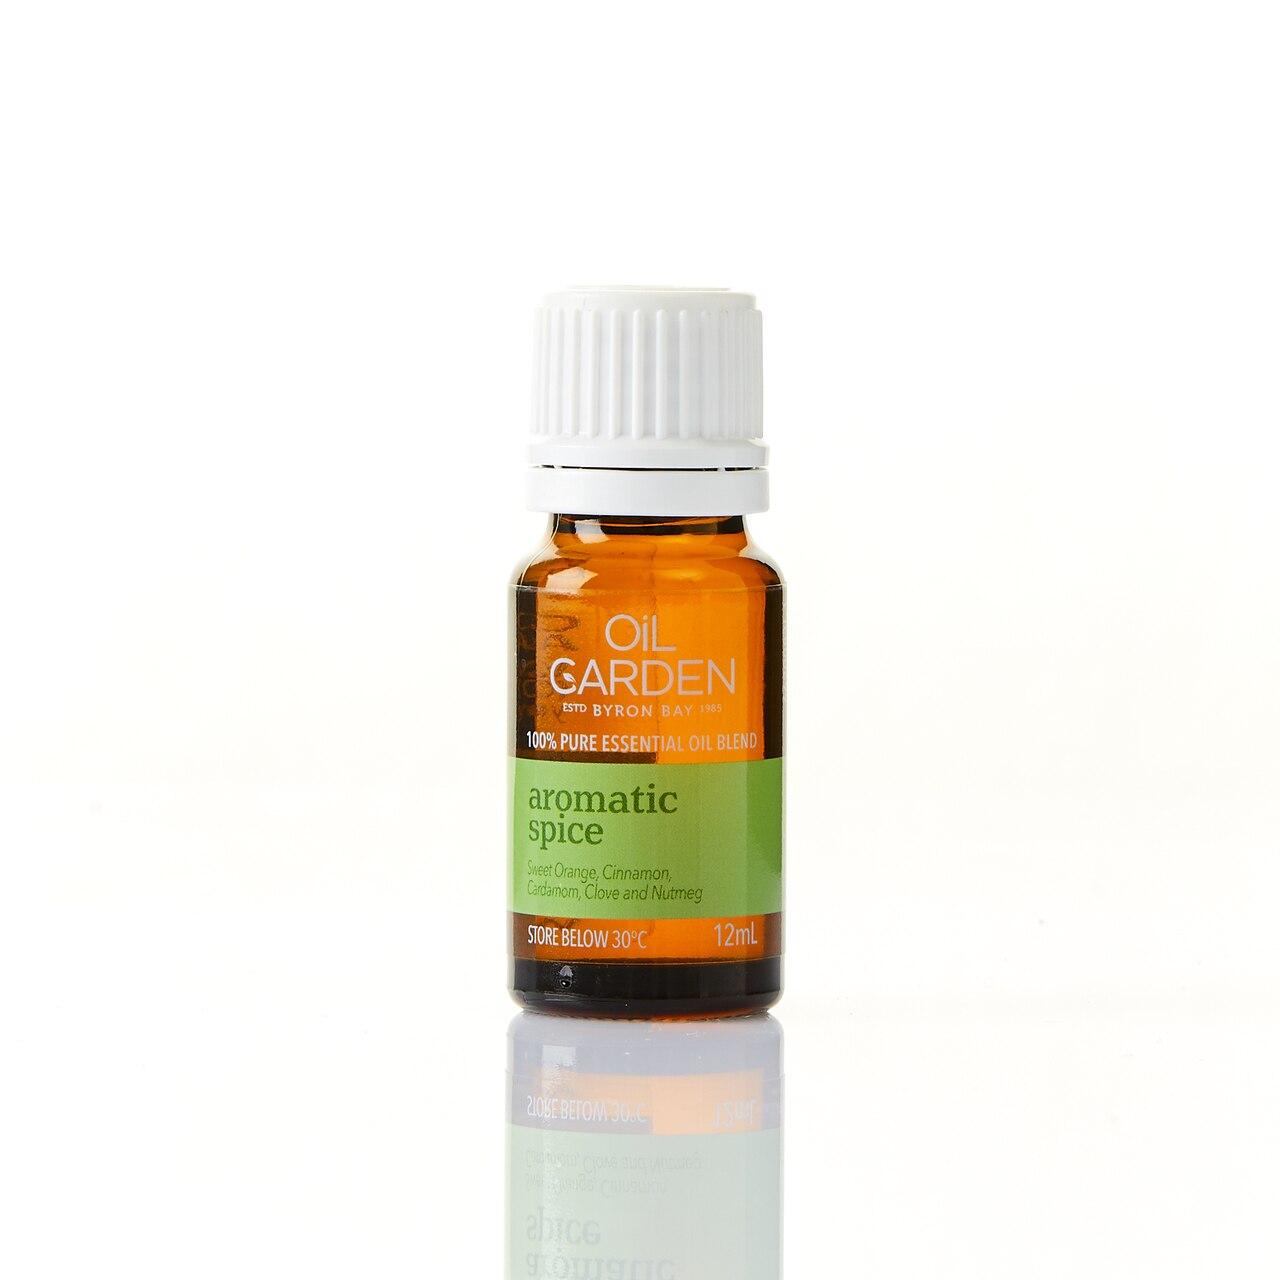 Oil Garden Aromatic Spice Essential Oil Blend 12mL 6620083